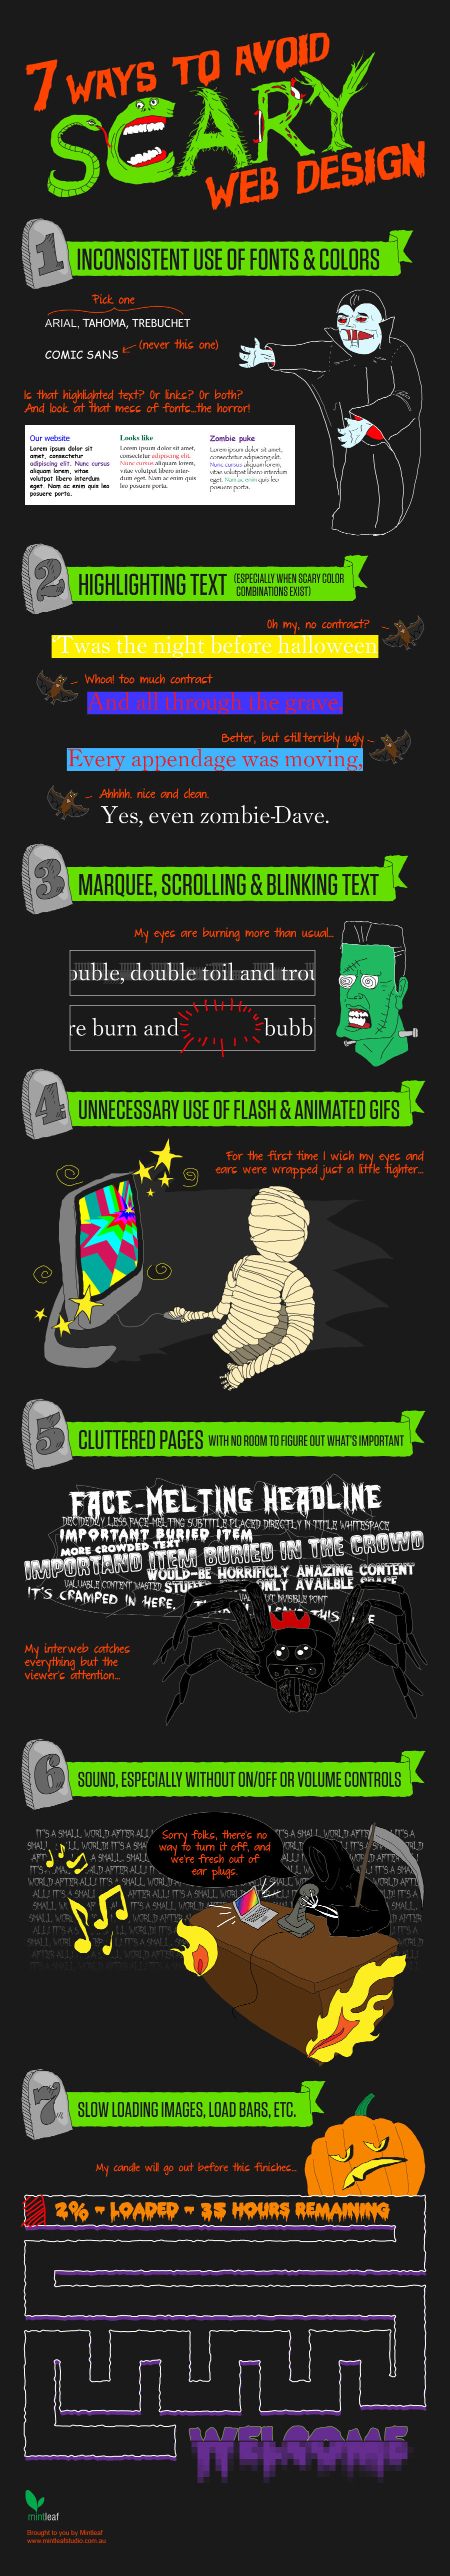 scary web design